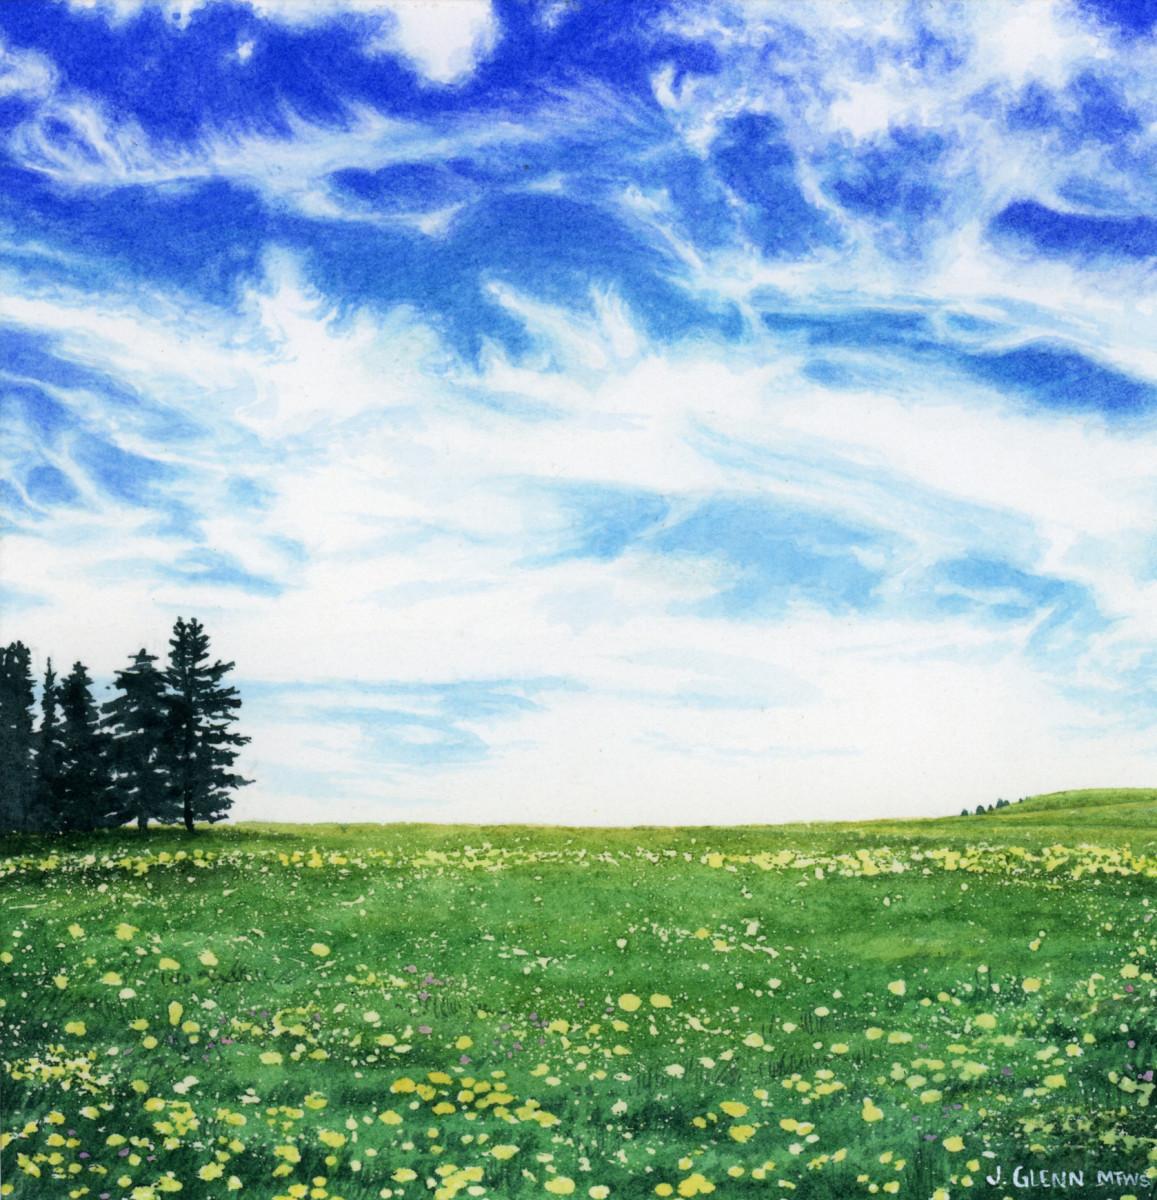 High Mountain Dreamin' by Jessica Glenn